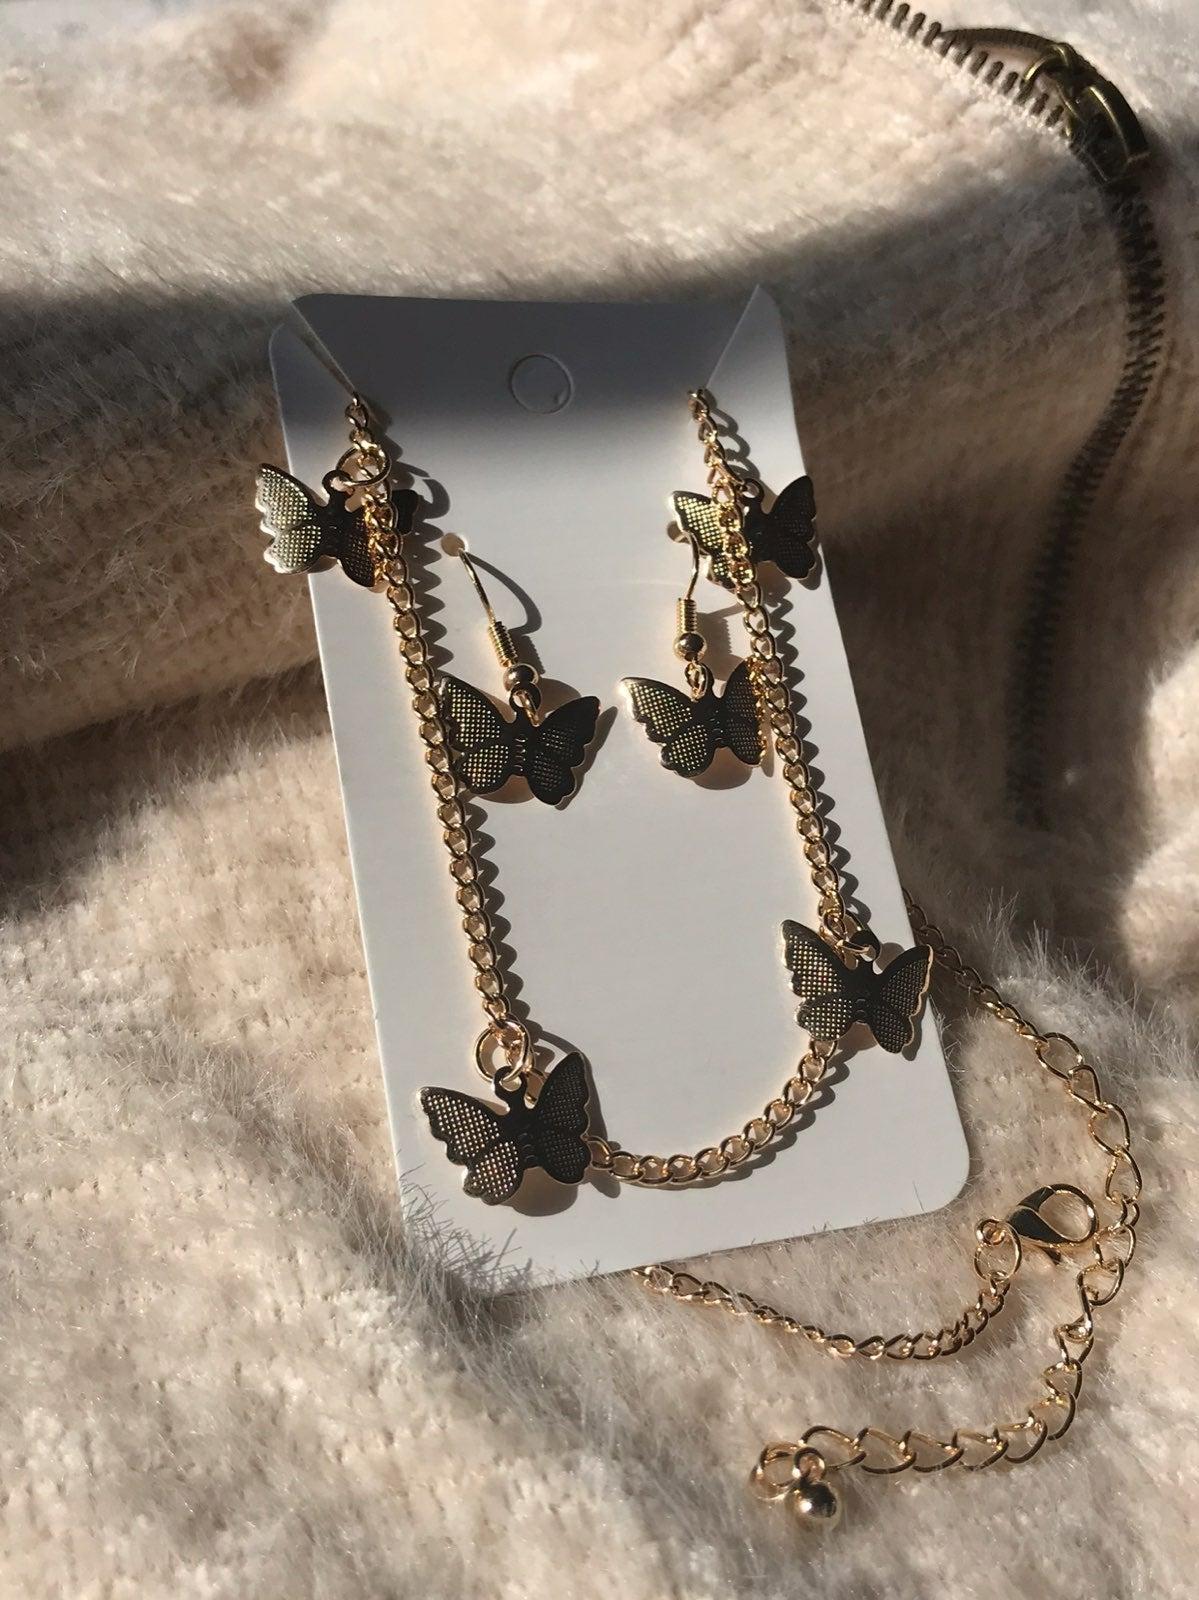 Butterfly Necklace Earring Set